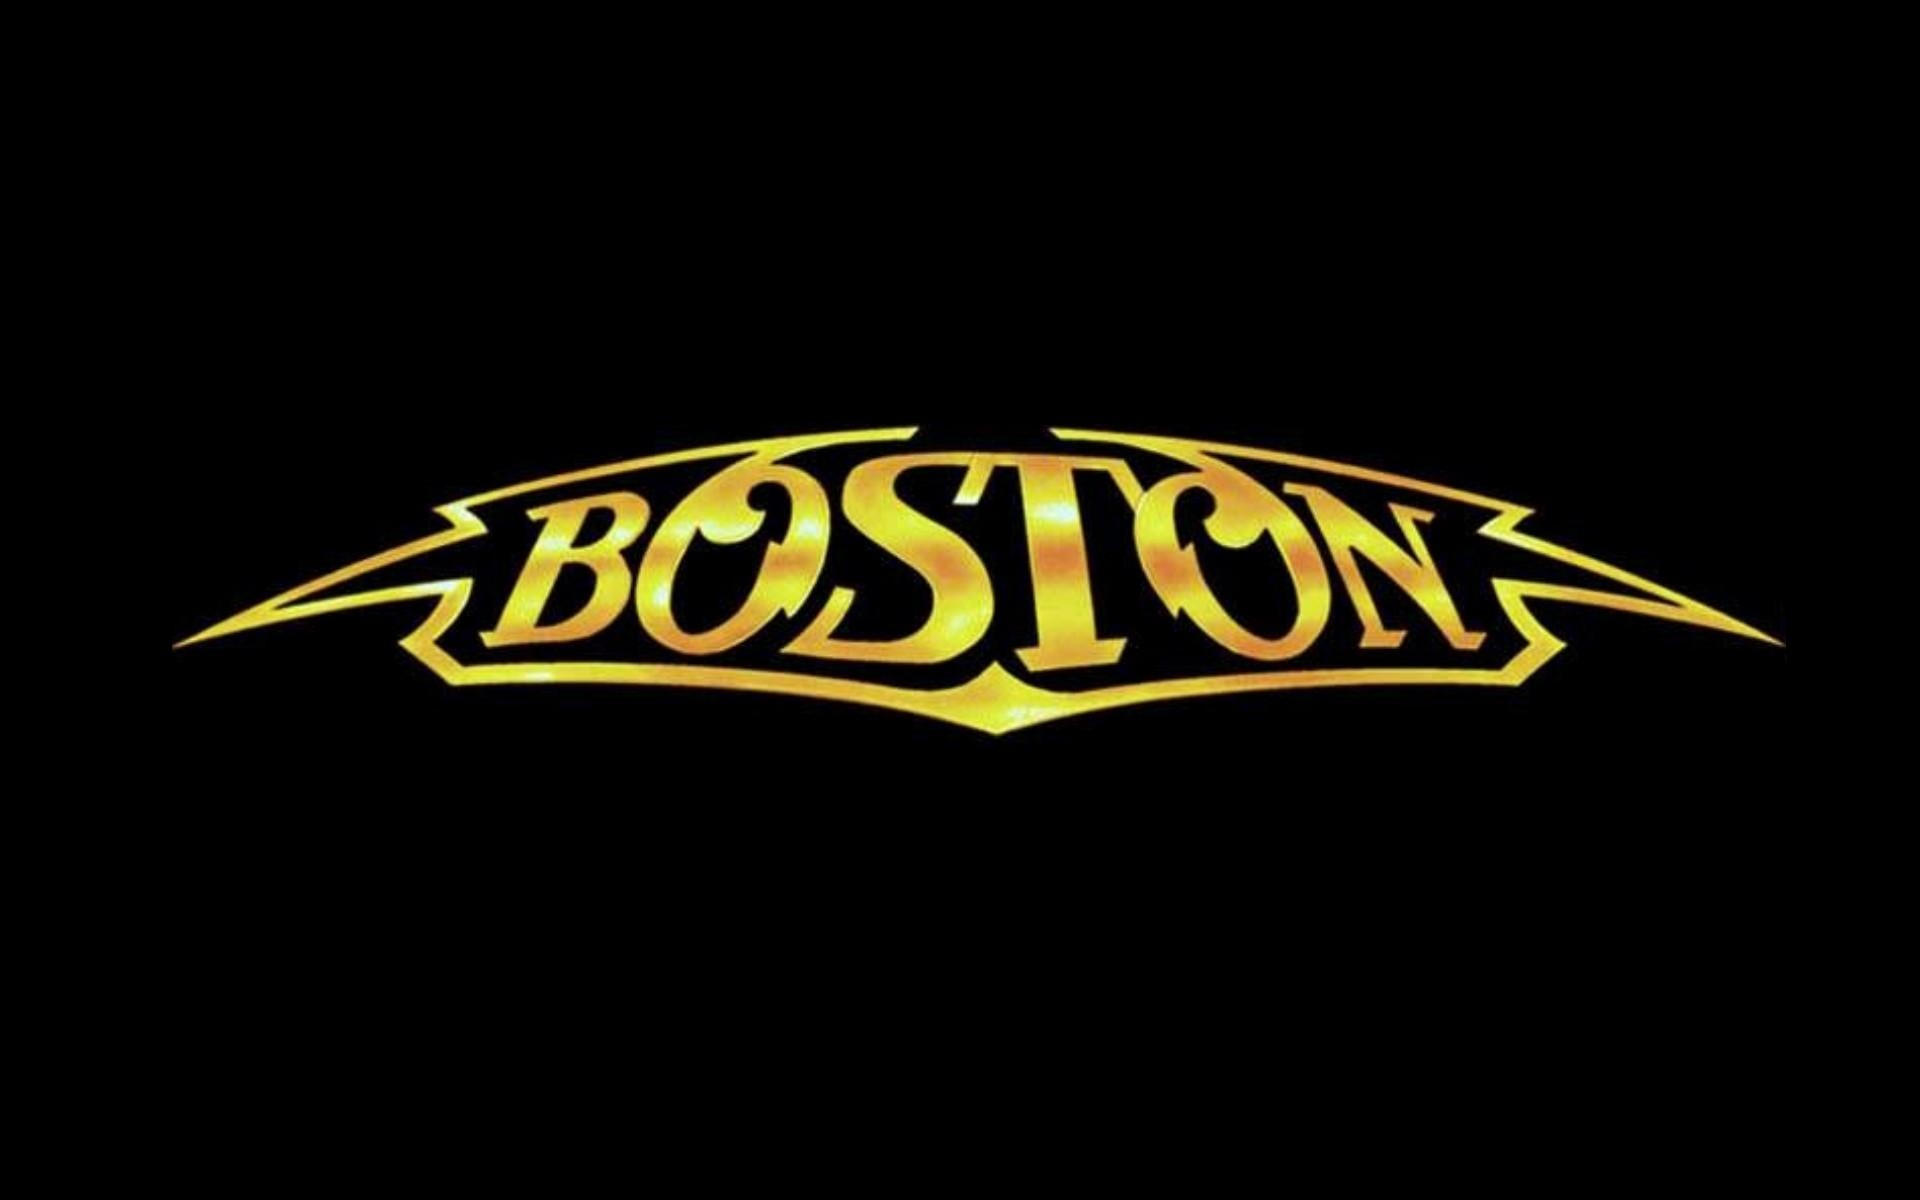 Wallpaper boston logo classic rock desktop wallpaper Music 1920x1200